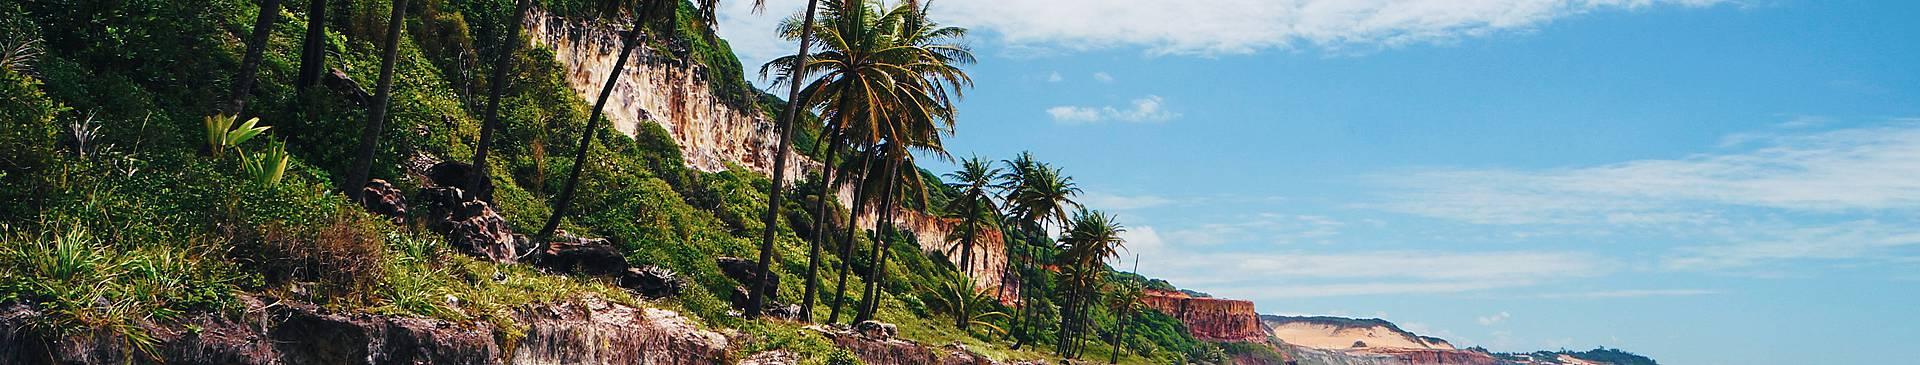 Viajes a Brasil en verano